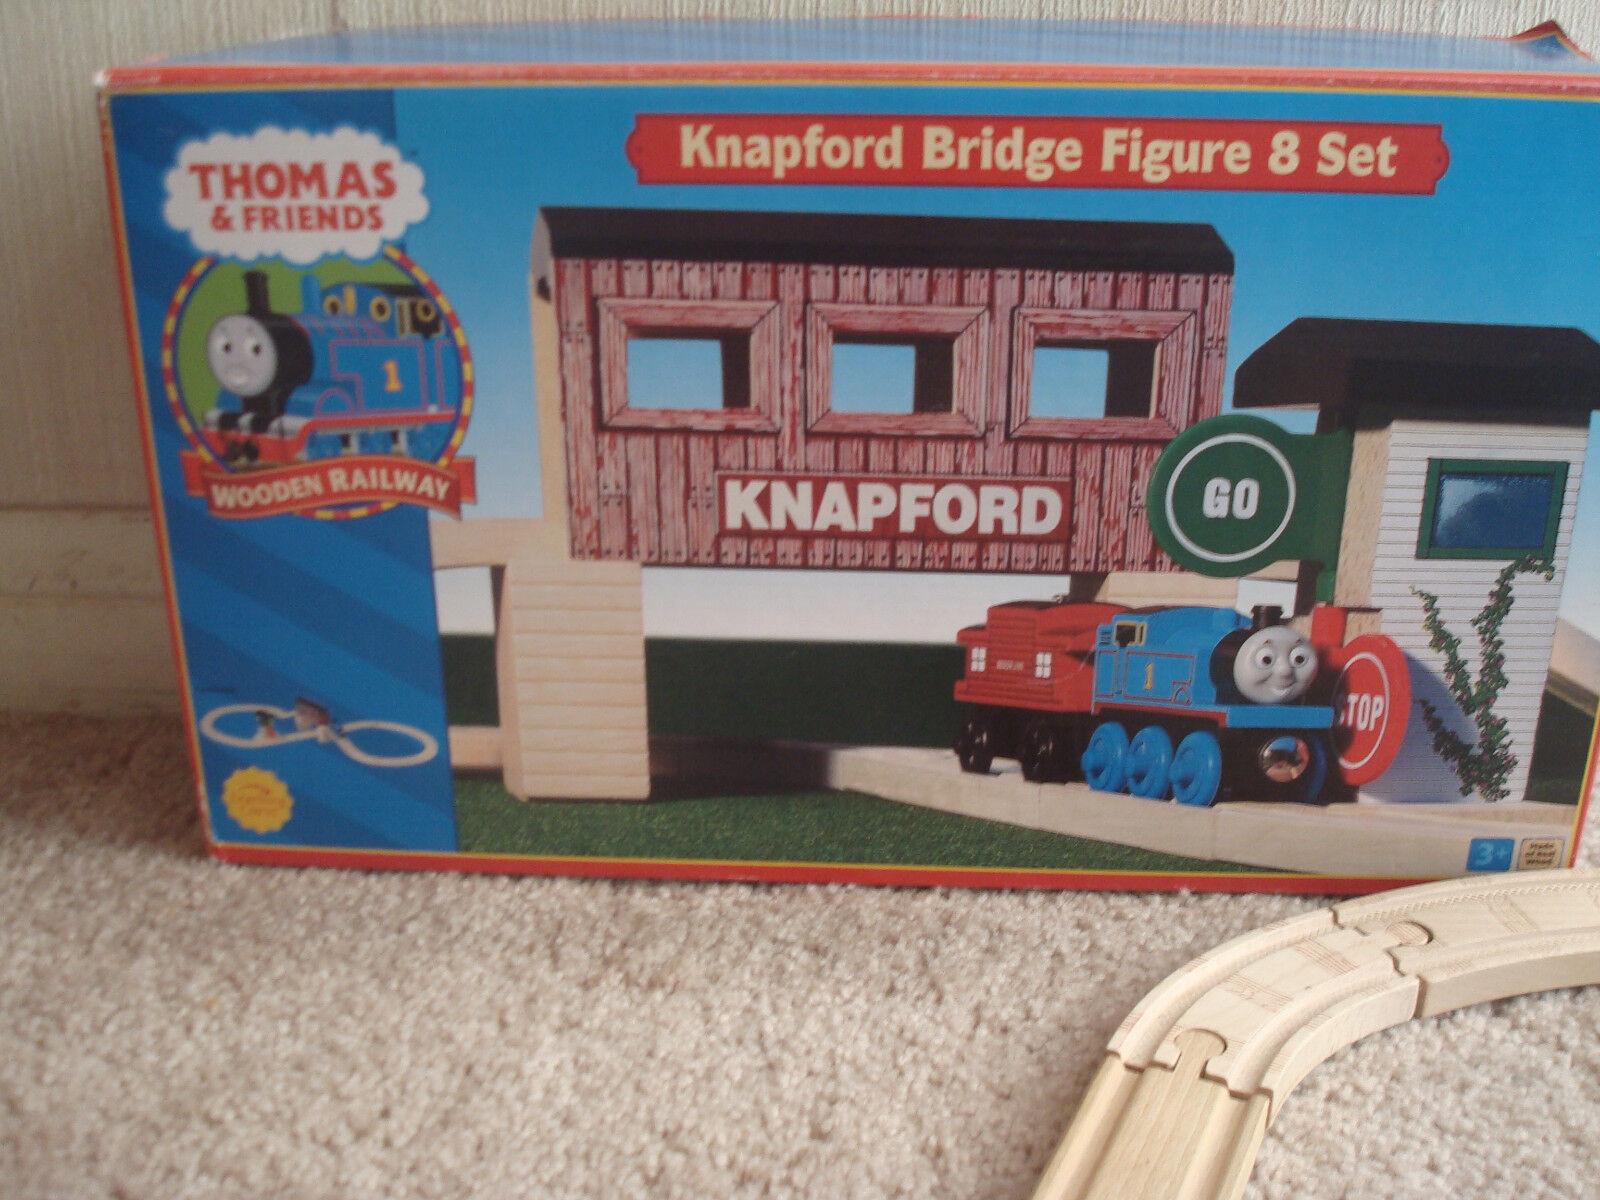 Thomas & Friends Wooden Railway Knapford Bridge Figure 8 Set Thomas Train Box